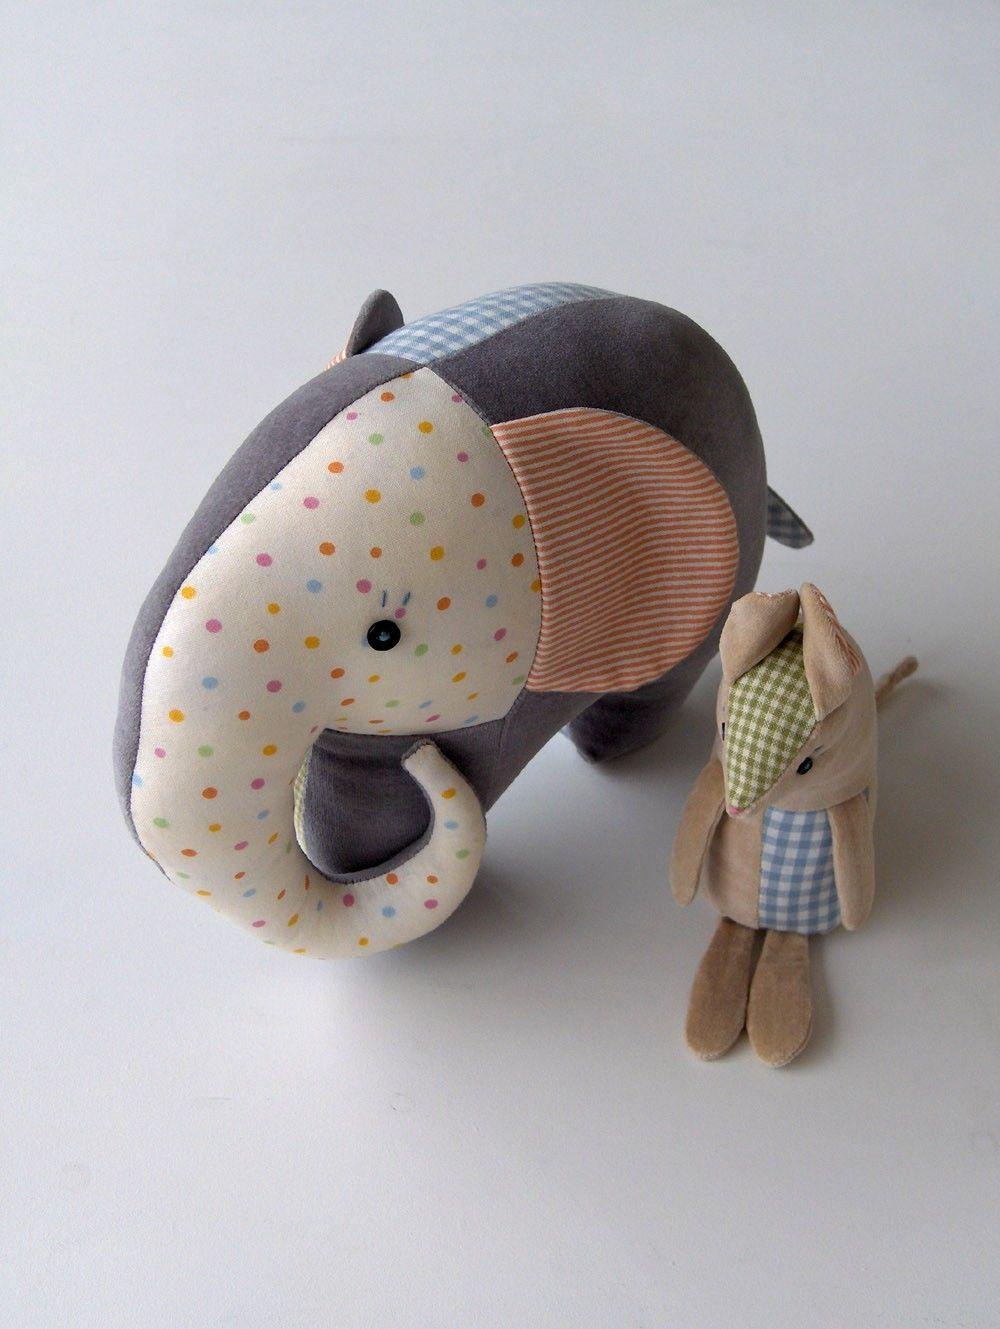 Piccabu Elephant and Molehill Mouse | Tiere nähen, Nähe und Nähen